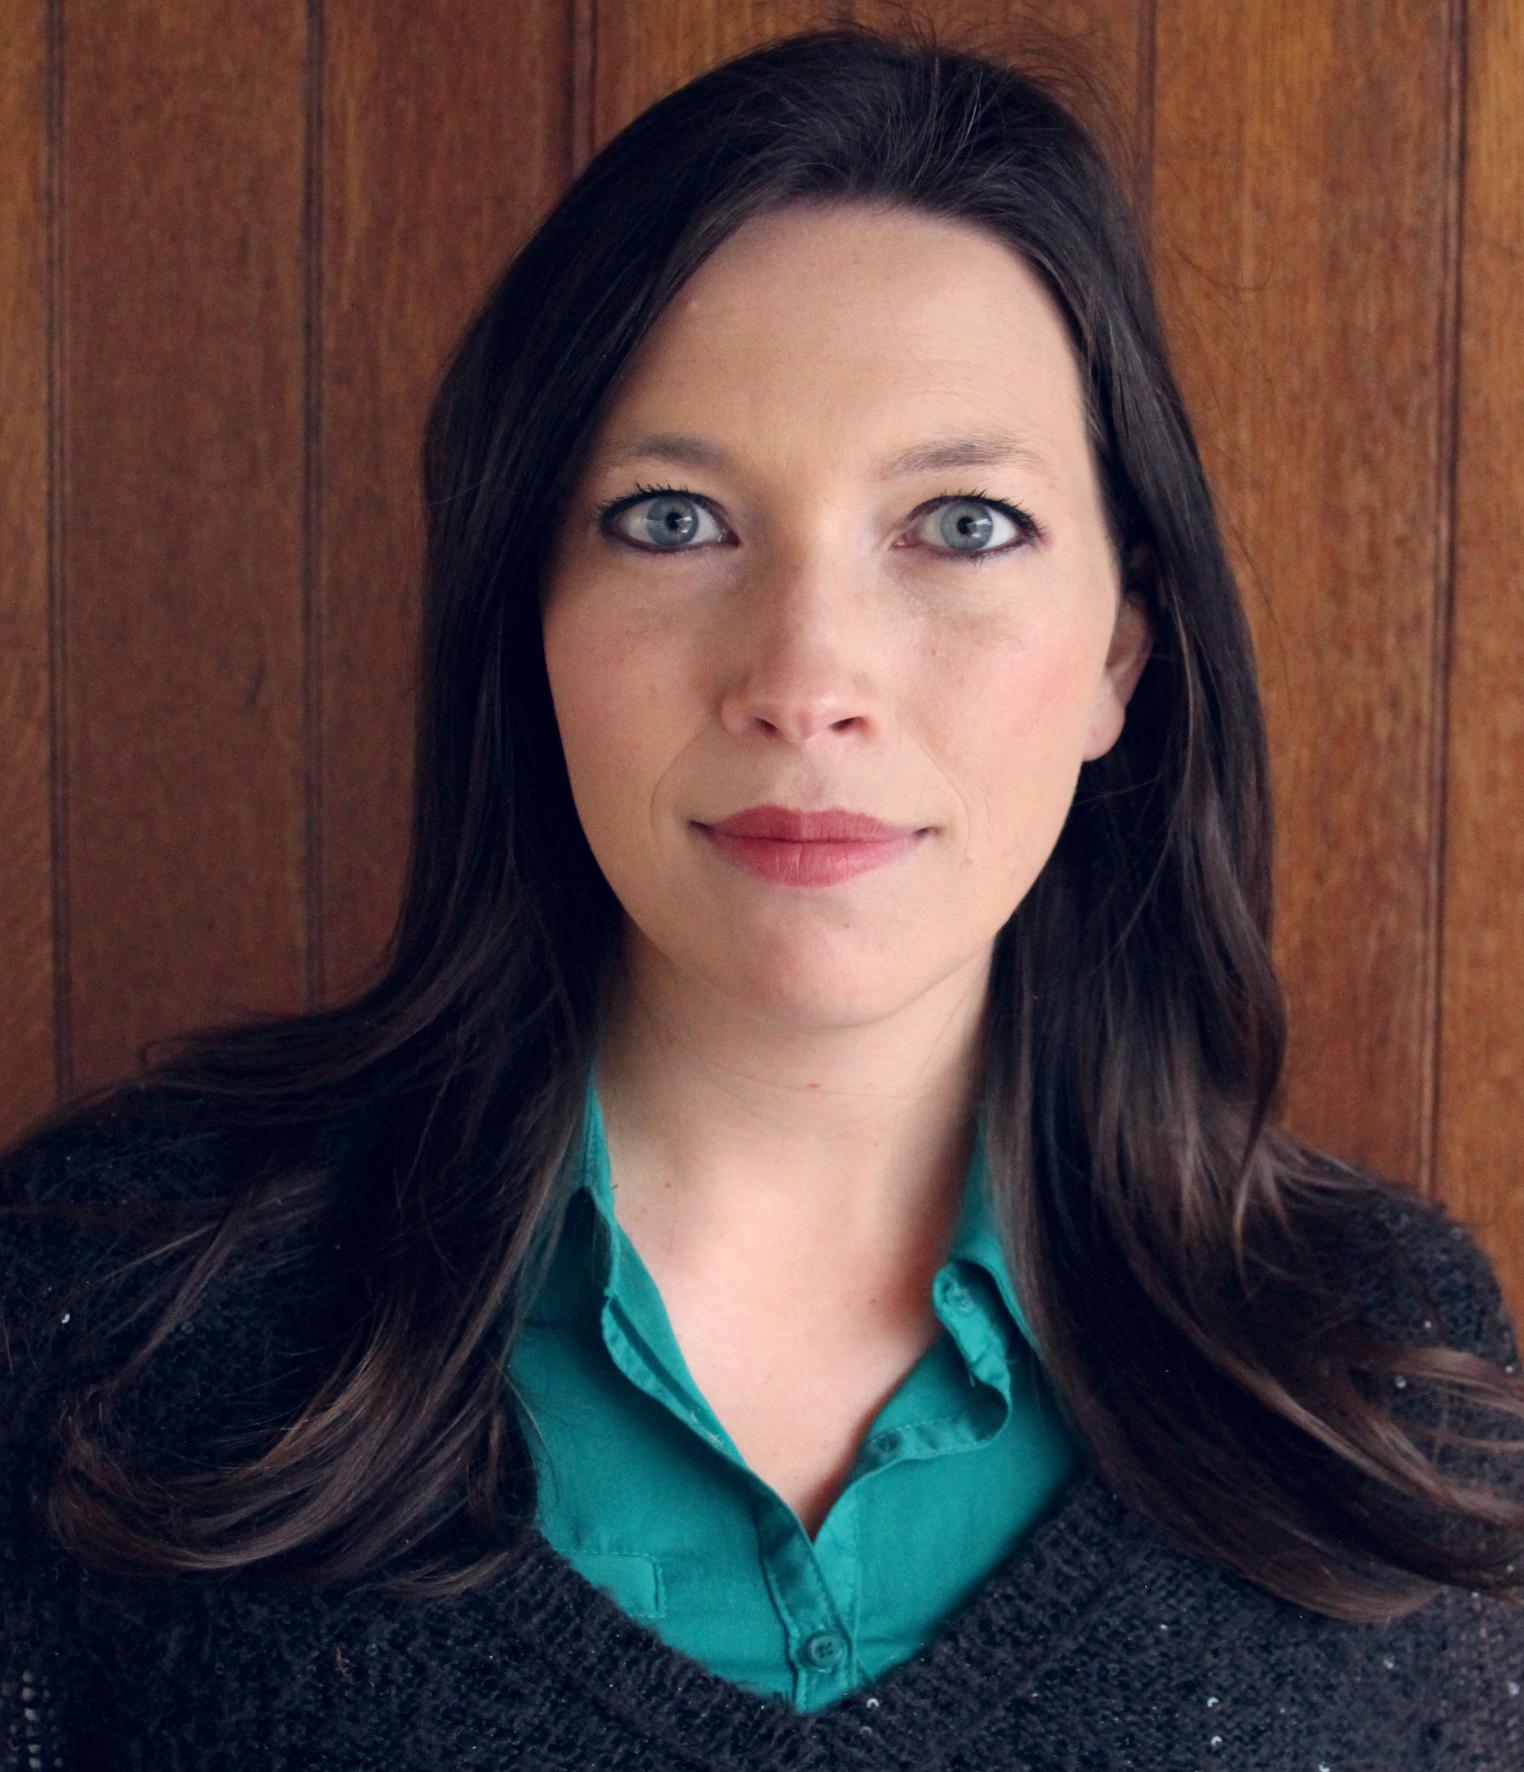 headshot of author Amy Green